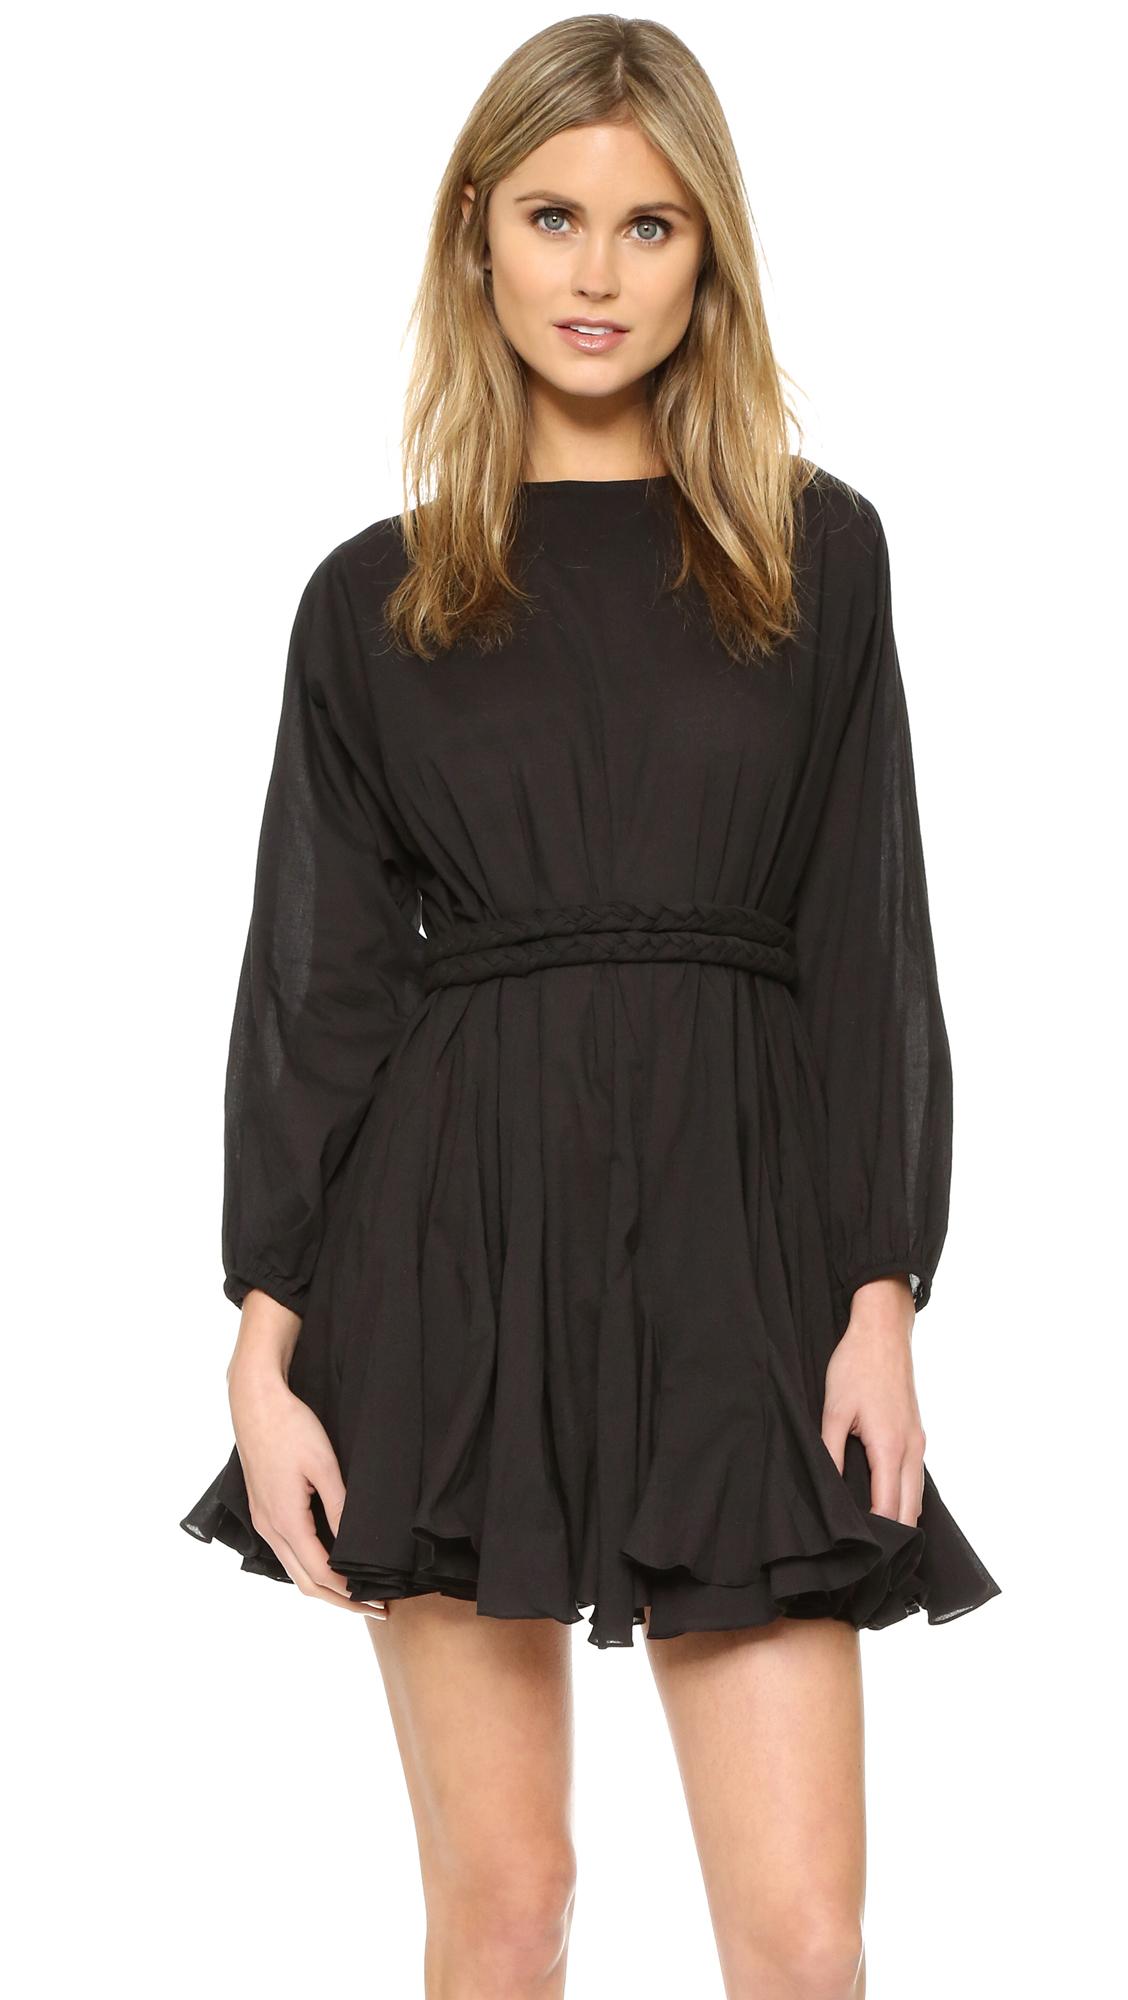 b4771d6ba9559e Lyst - Rhode Resort Ella Dress in Black